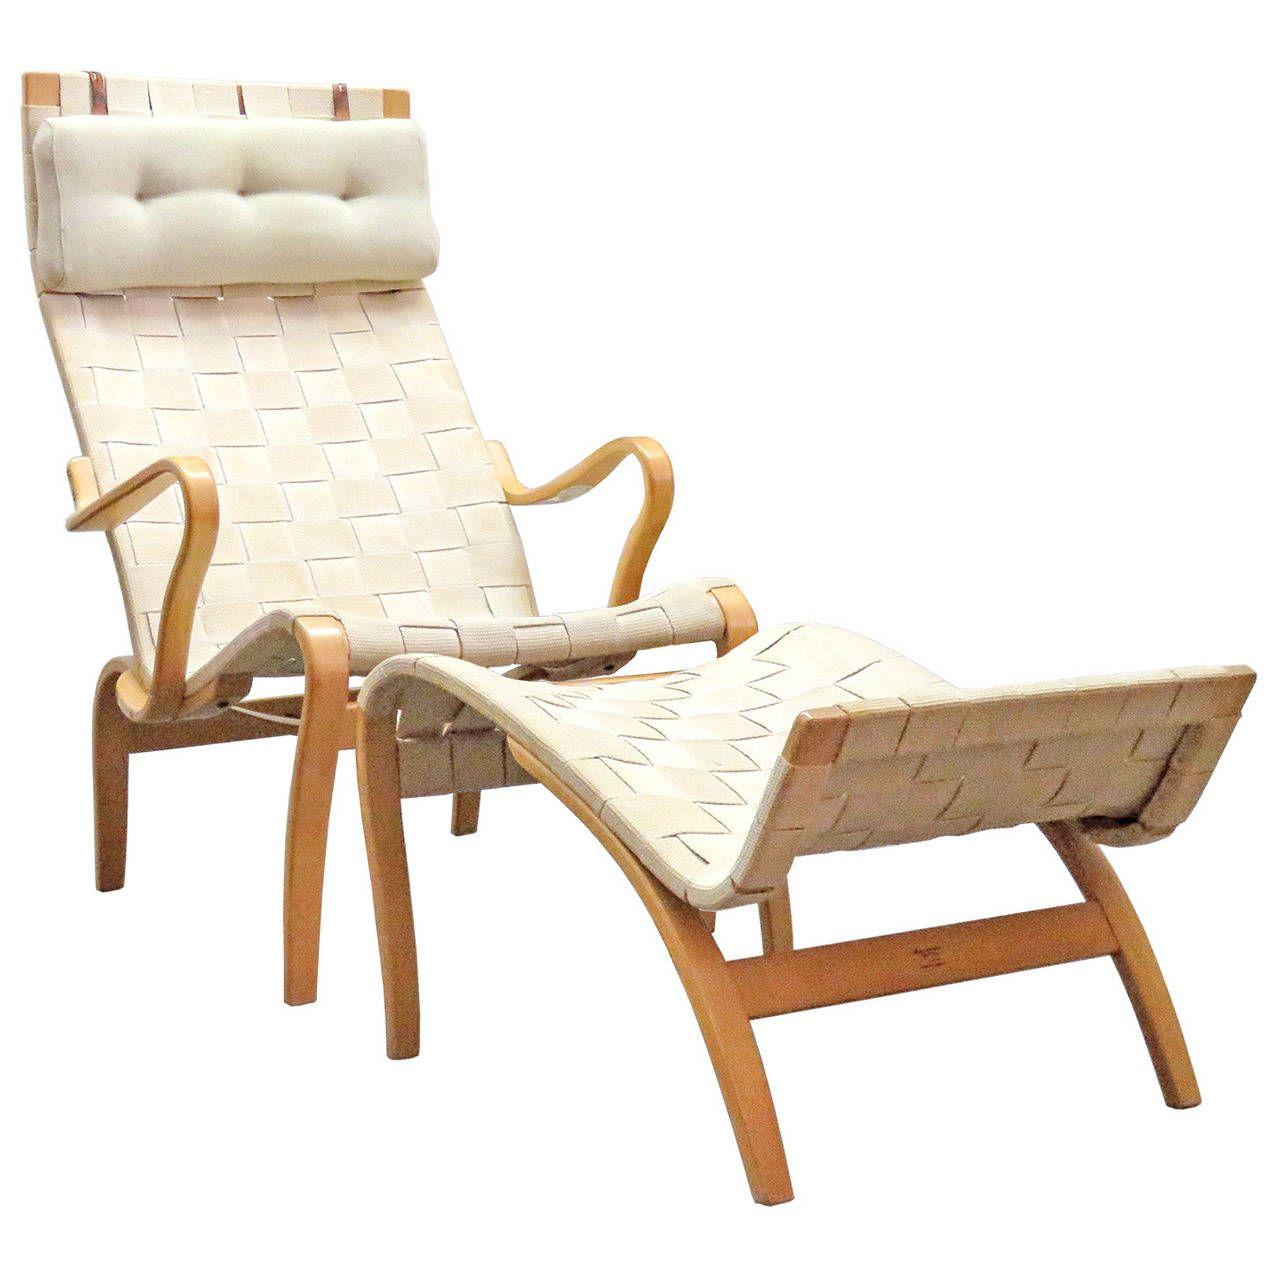 master Miranda Lounge Chairs and Ottoman by Bruno Mathsson